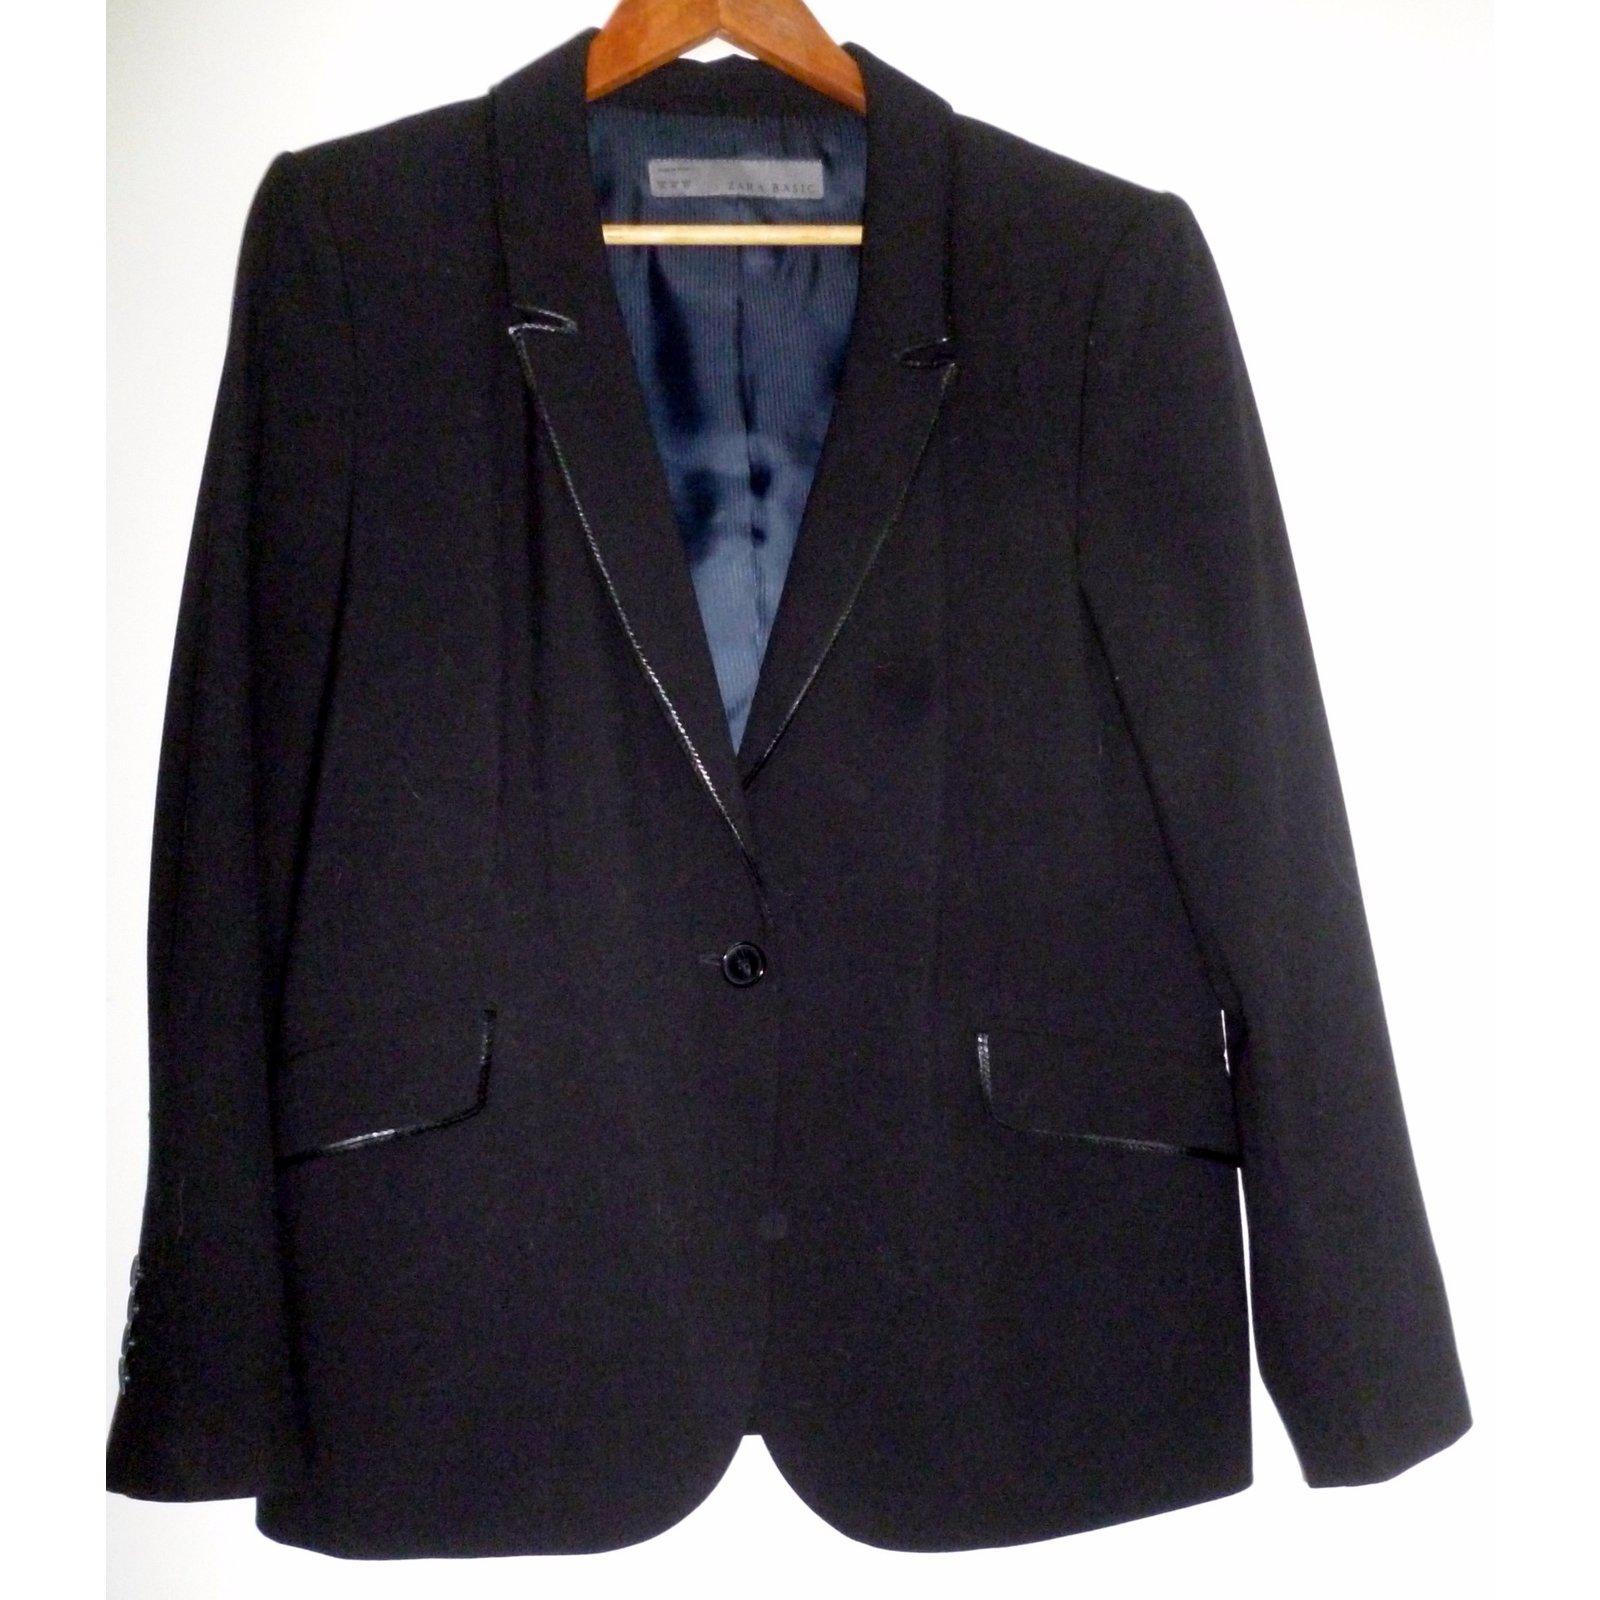 Ref Veste Noir Polyester Joli Closet 31696 Zara Vestes RIqUwxT5